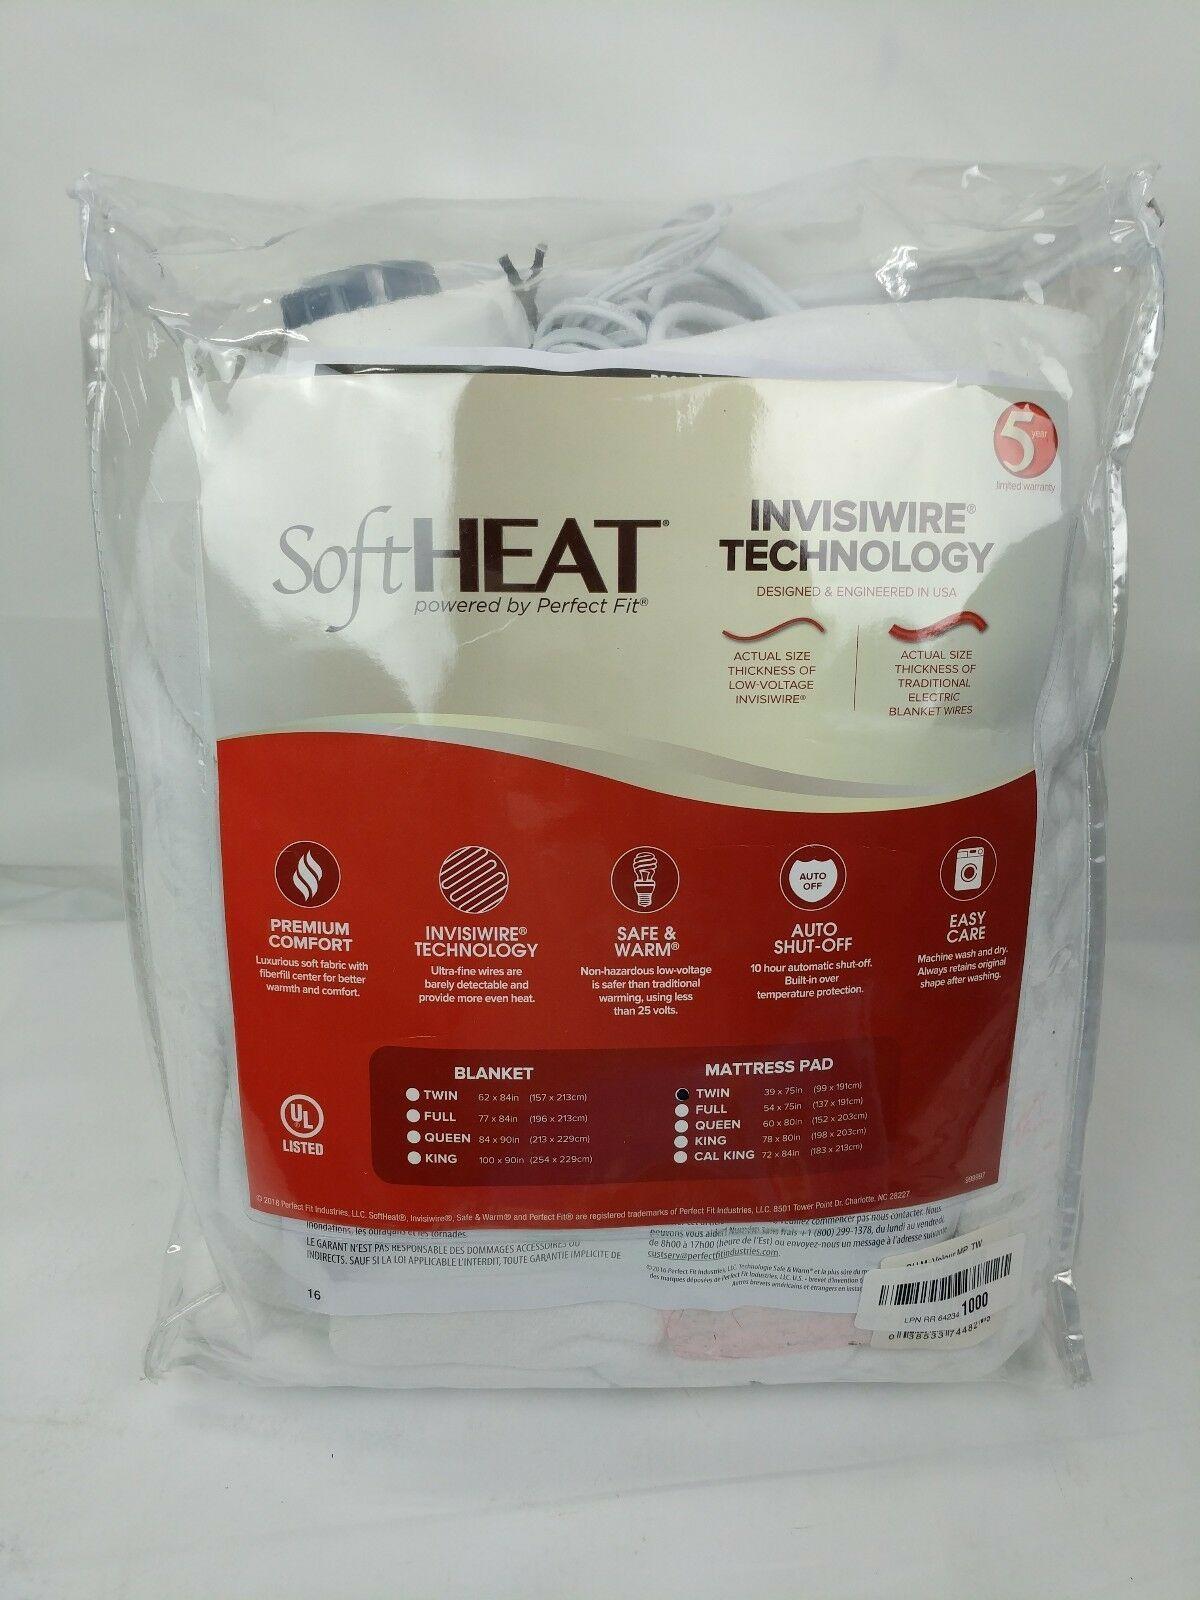 Perfect Fit Softheat Smart Heated Electric Mattress Pad Micro Plush Top Twin Mattress Pad Electric Mattress Pad Mattress